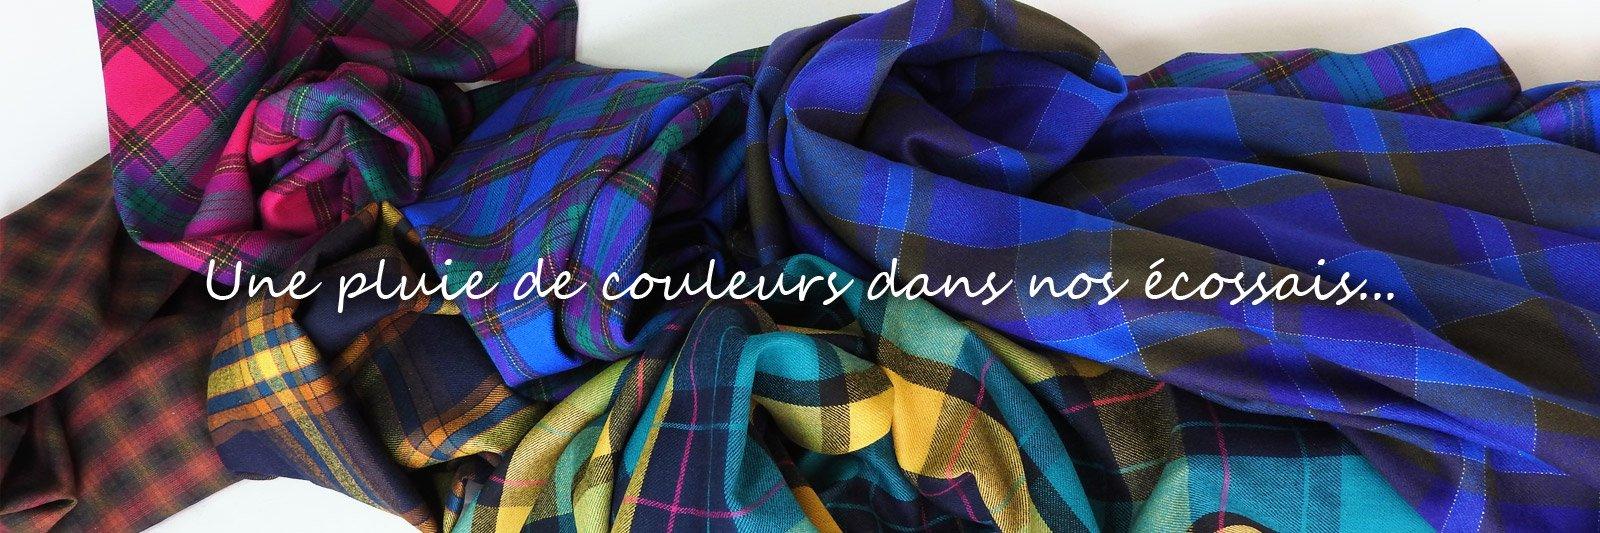 Tissu écossais vente de tissus au metre